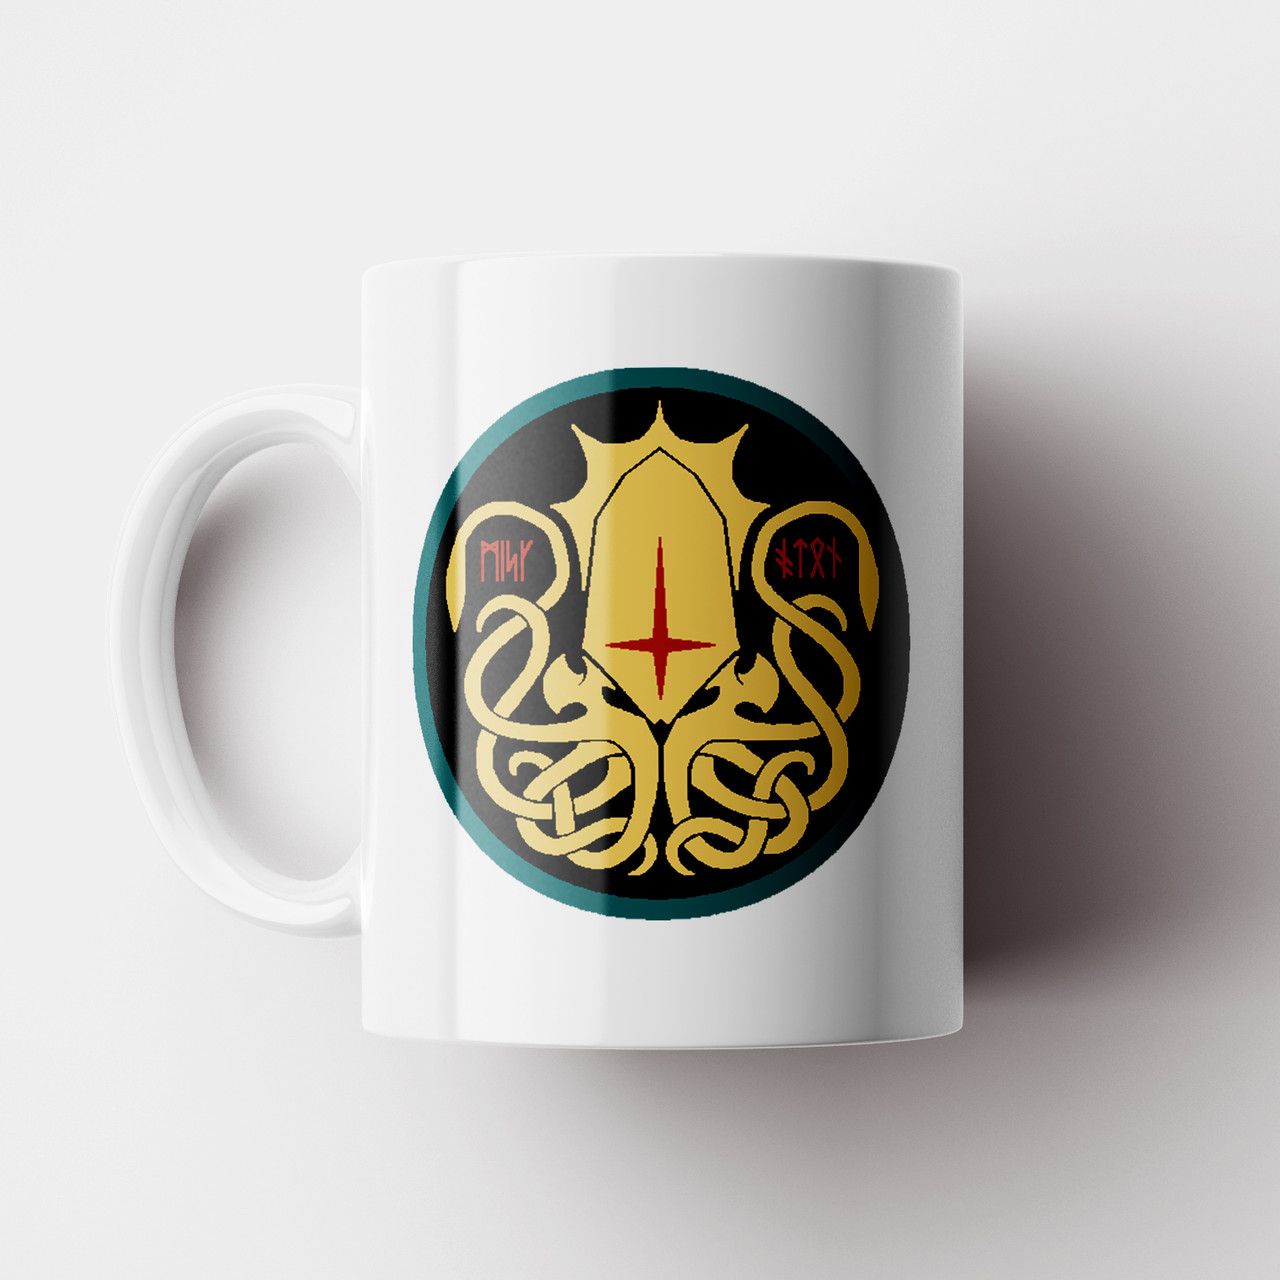 Чашка Ктулху. Лавкрафт Говард Филлипс.Lovecraft Cthulhu.Чашка с фото